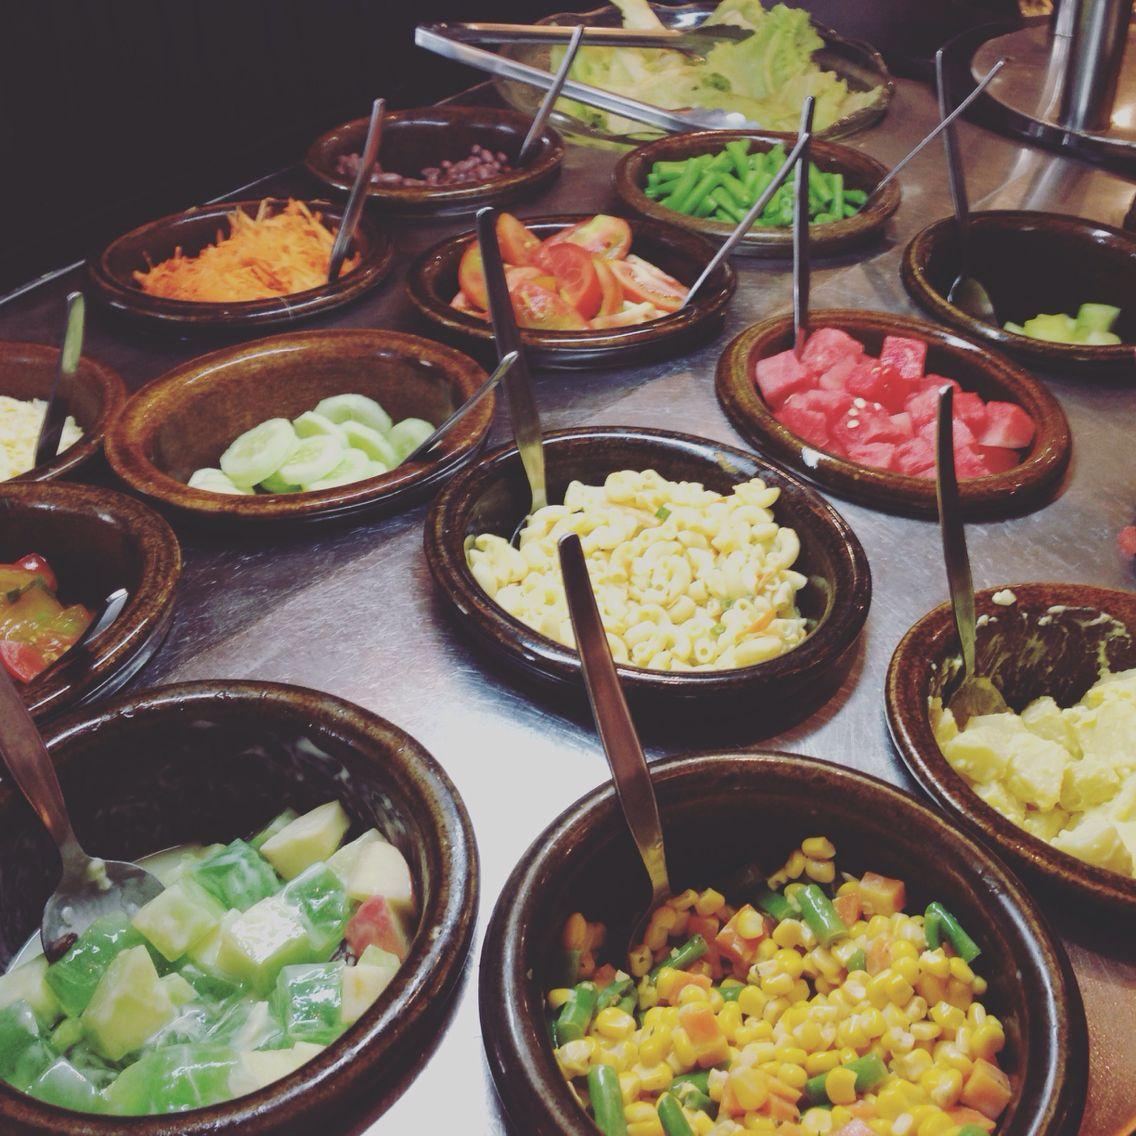 Salad bar pizza hut  Food dishes, Salad bar, Food